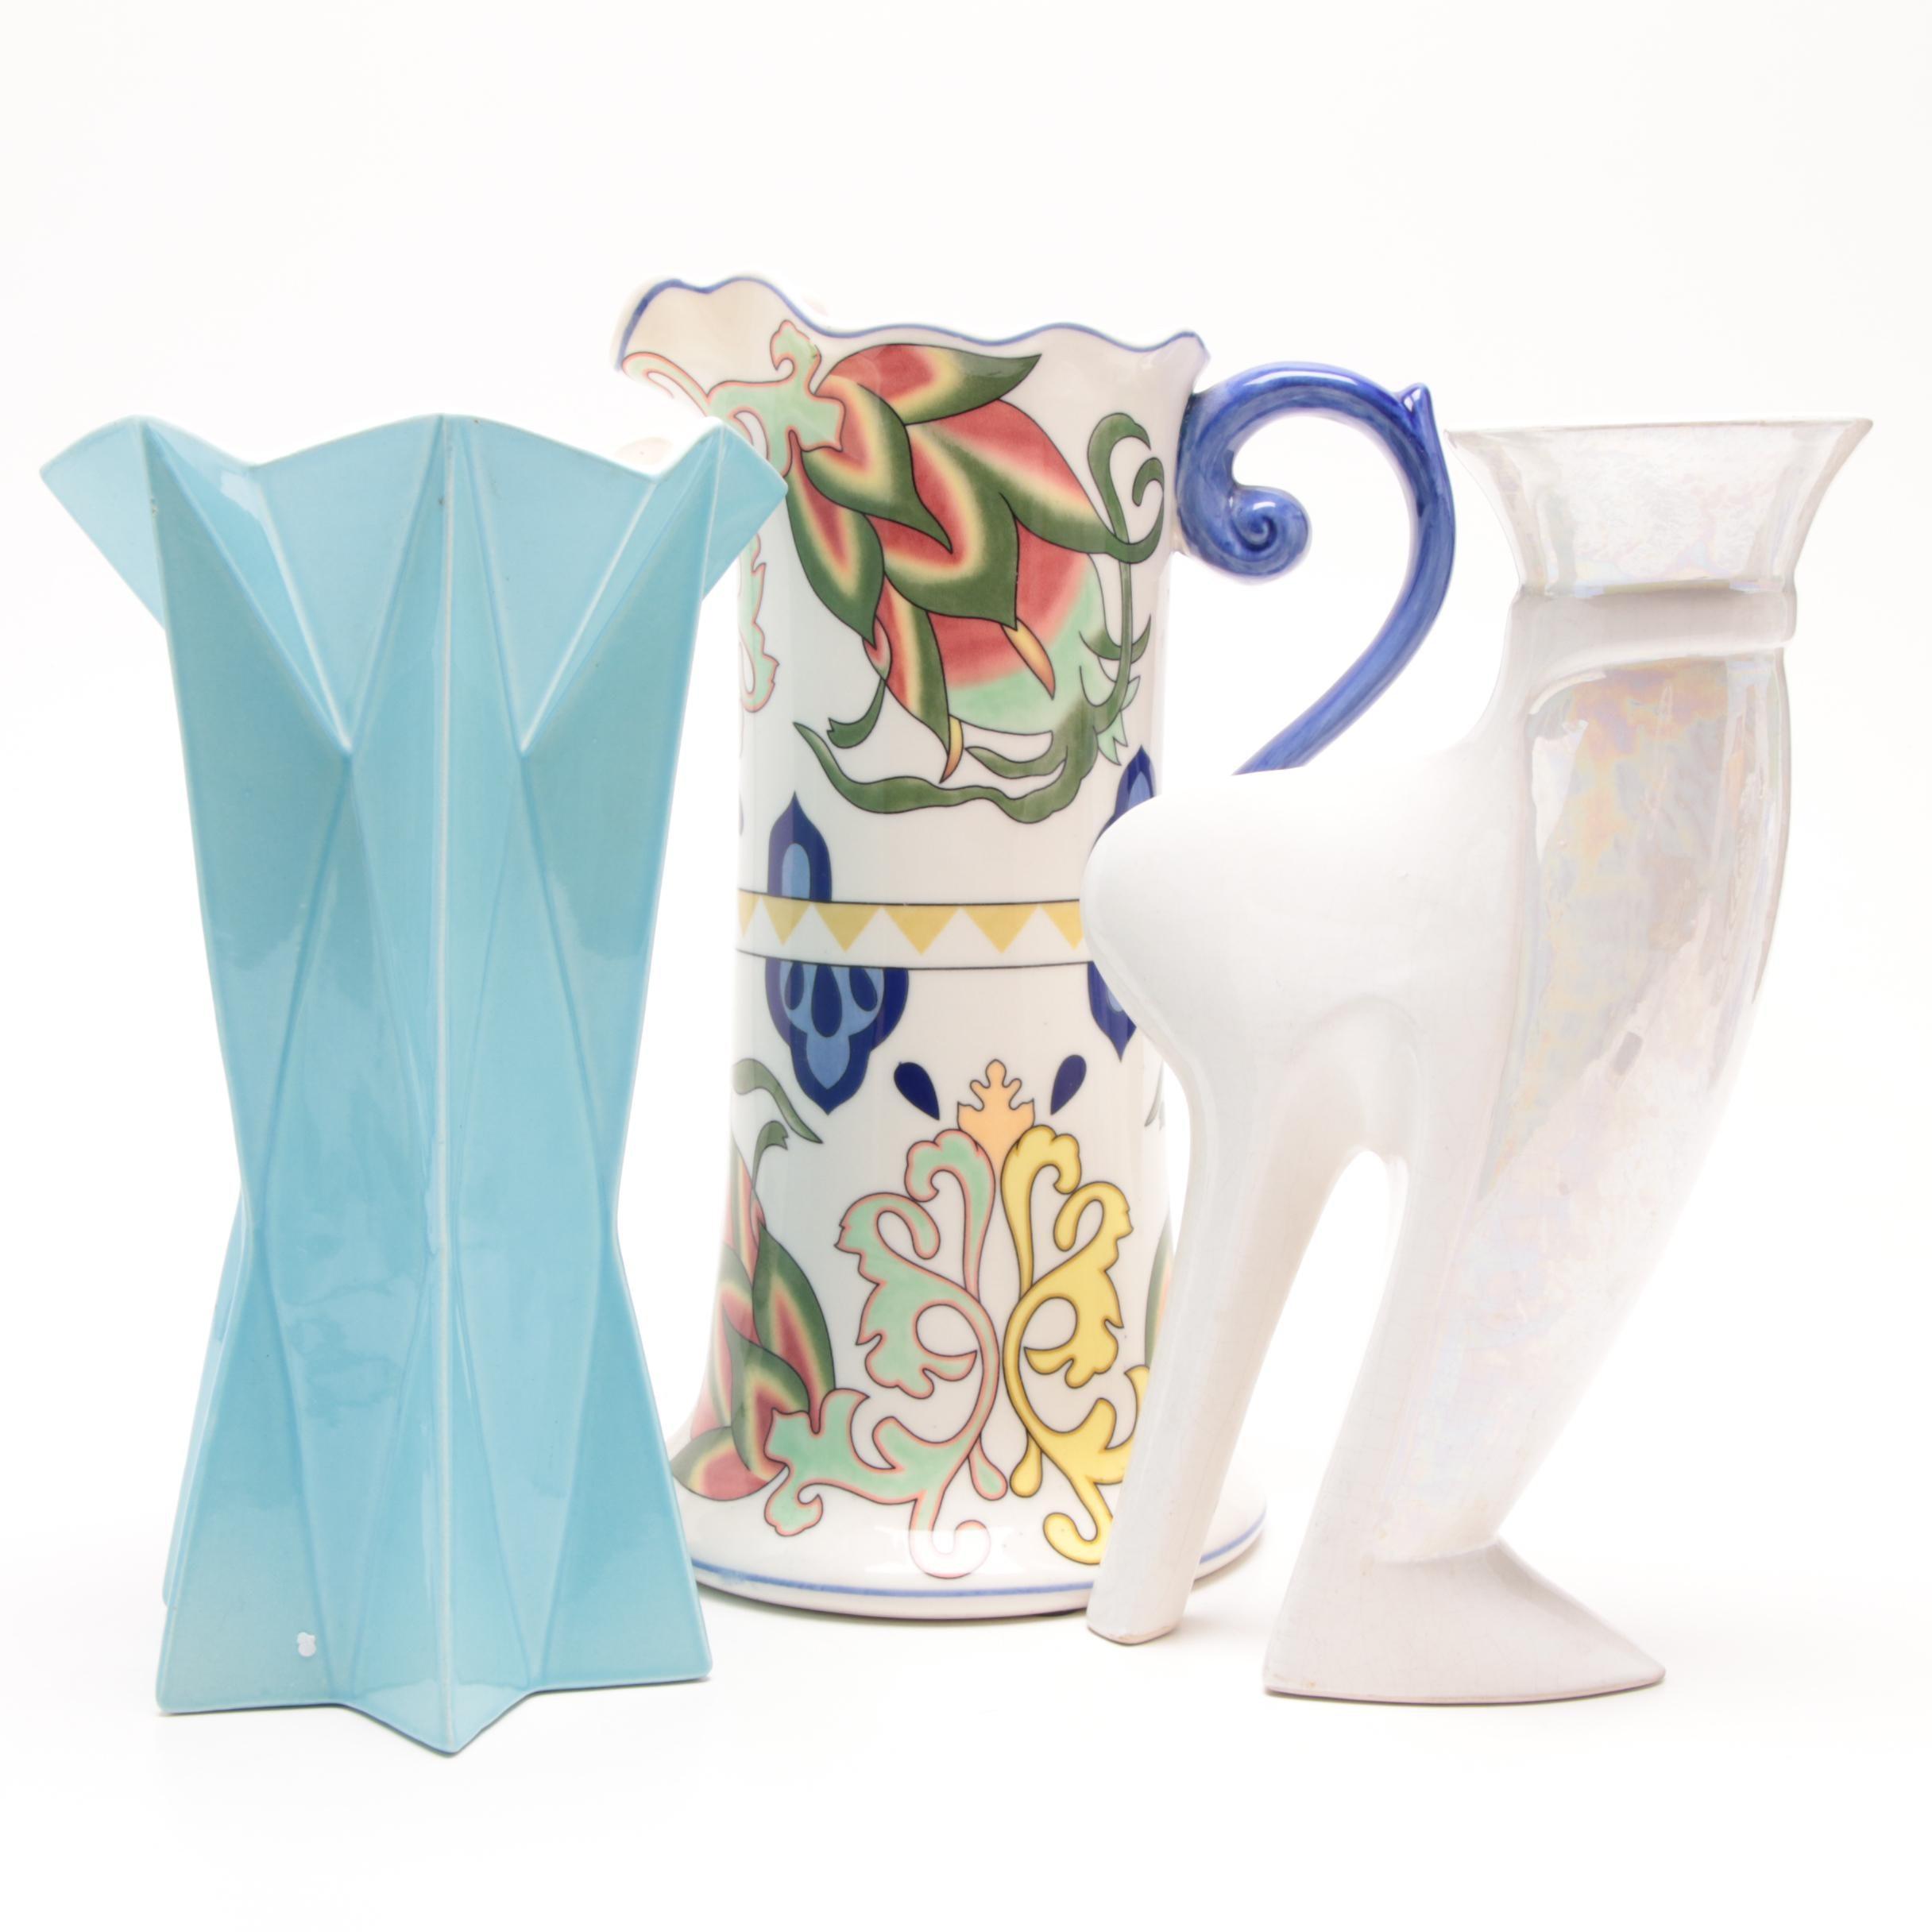 Ceramic Vases Including Red Wing